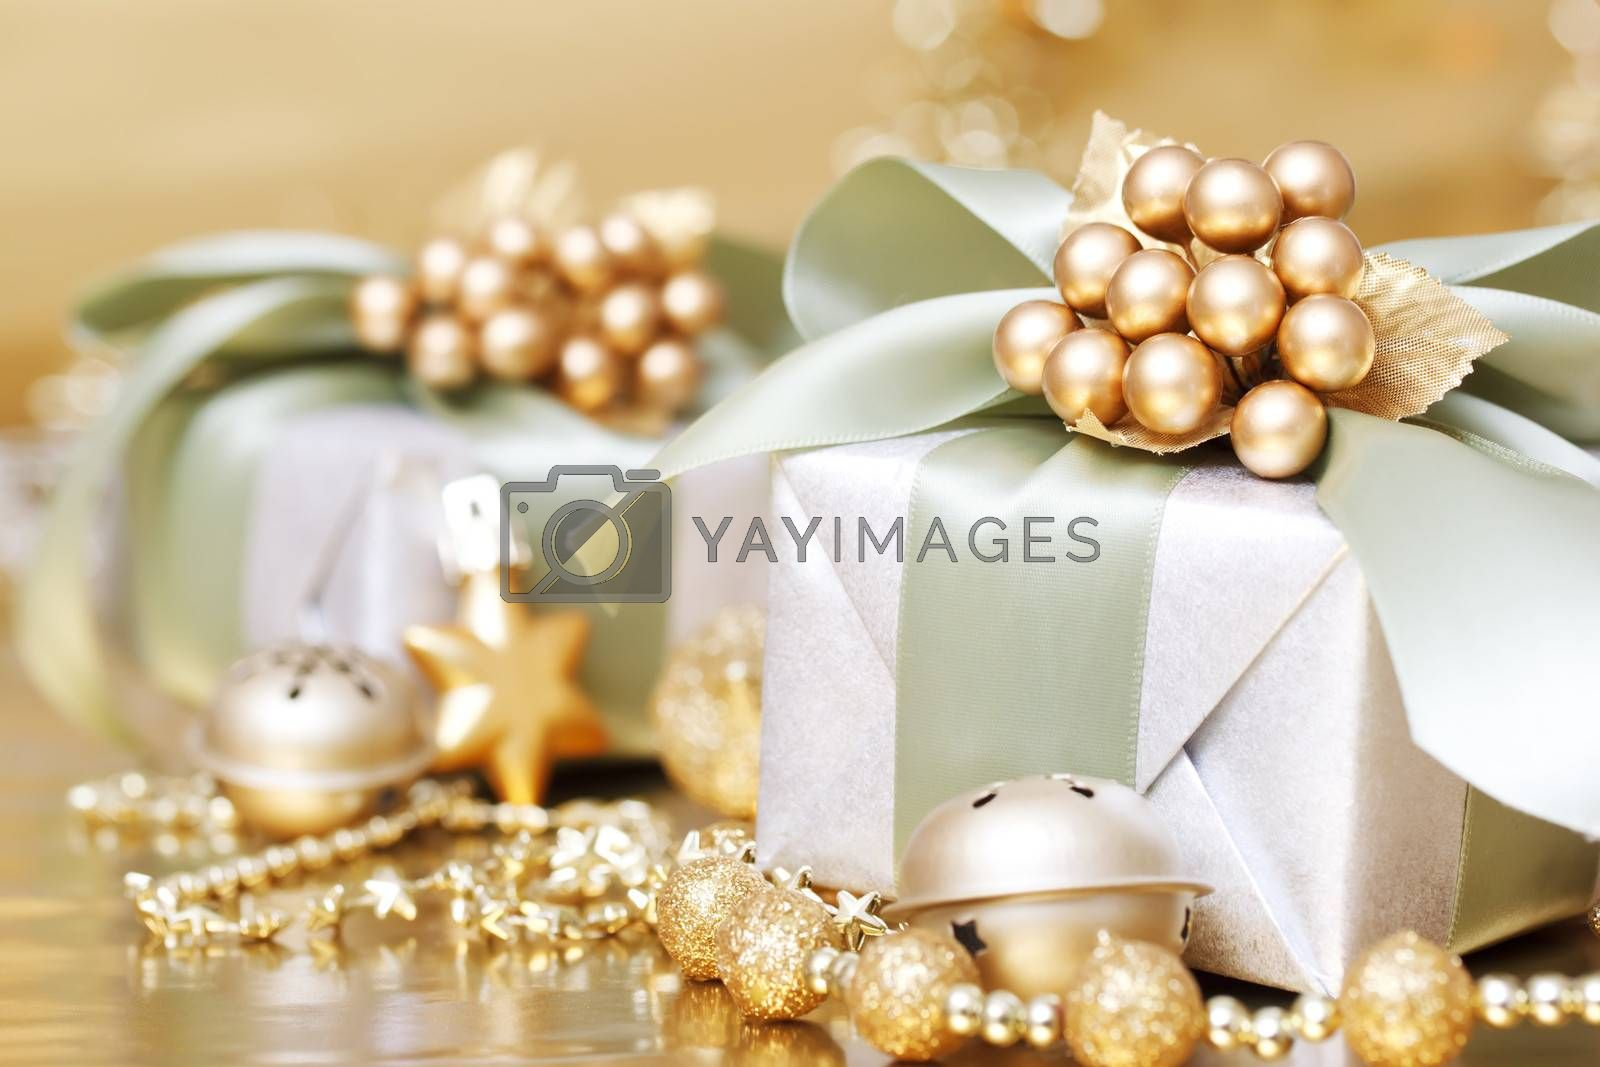 Royalty free image of Christmas Gift Box by melpomene